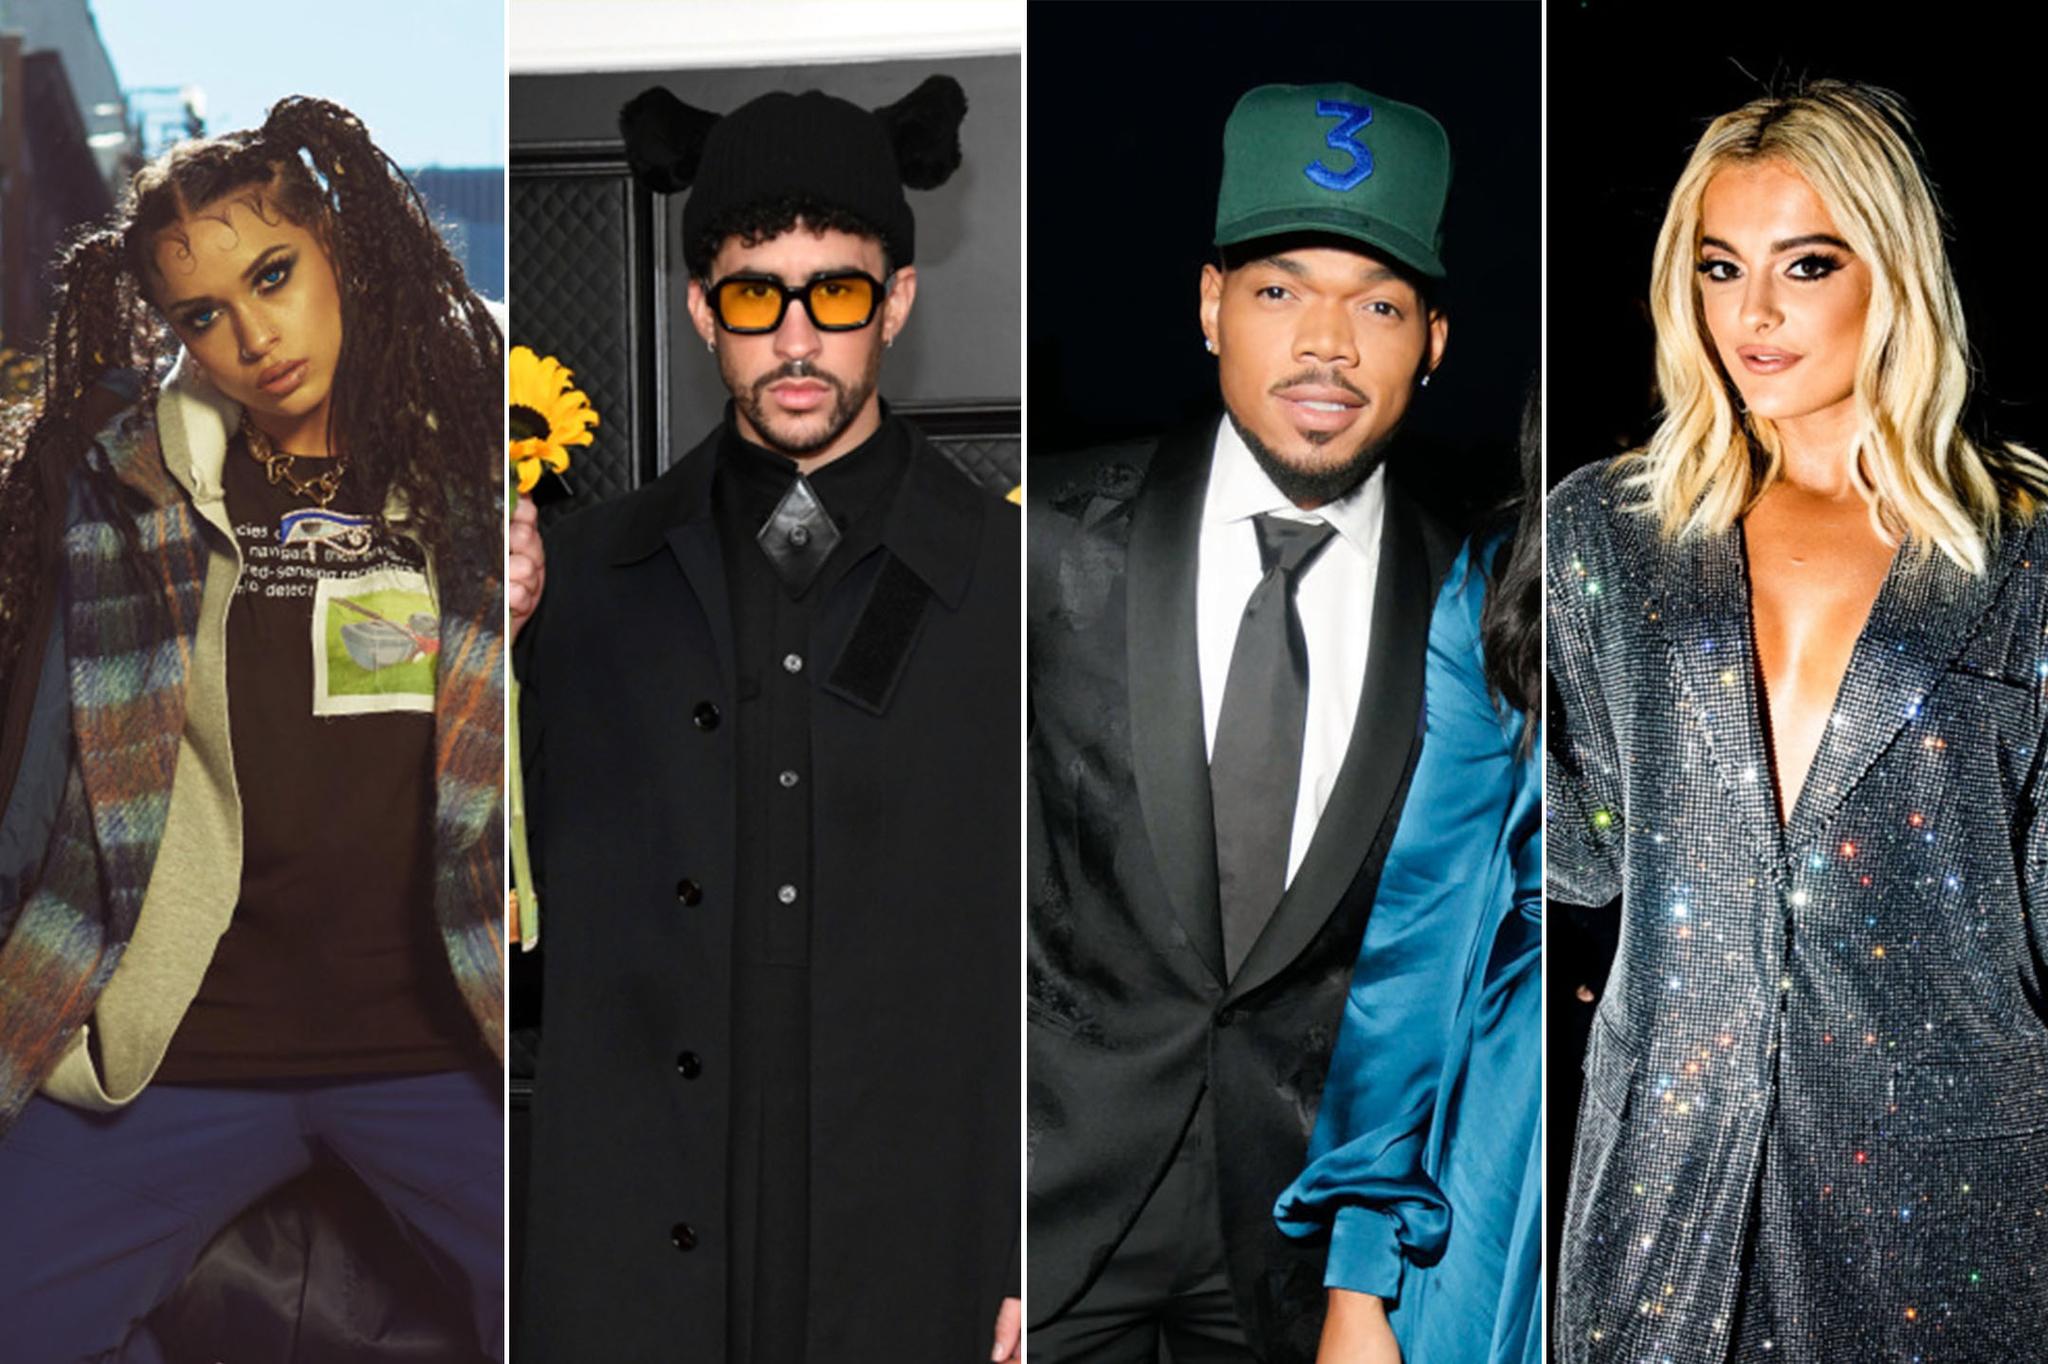 Princess Nokia, Bad Bunny, Chance The Rapper and Bebe Rexha